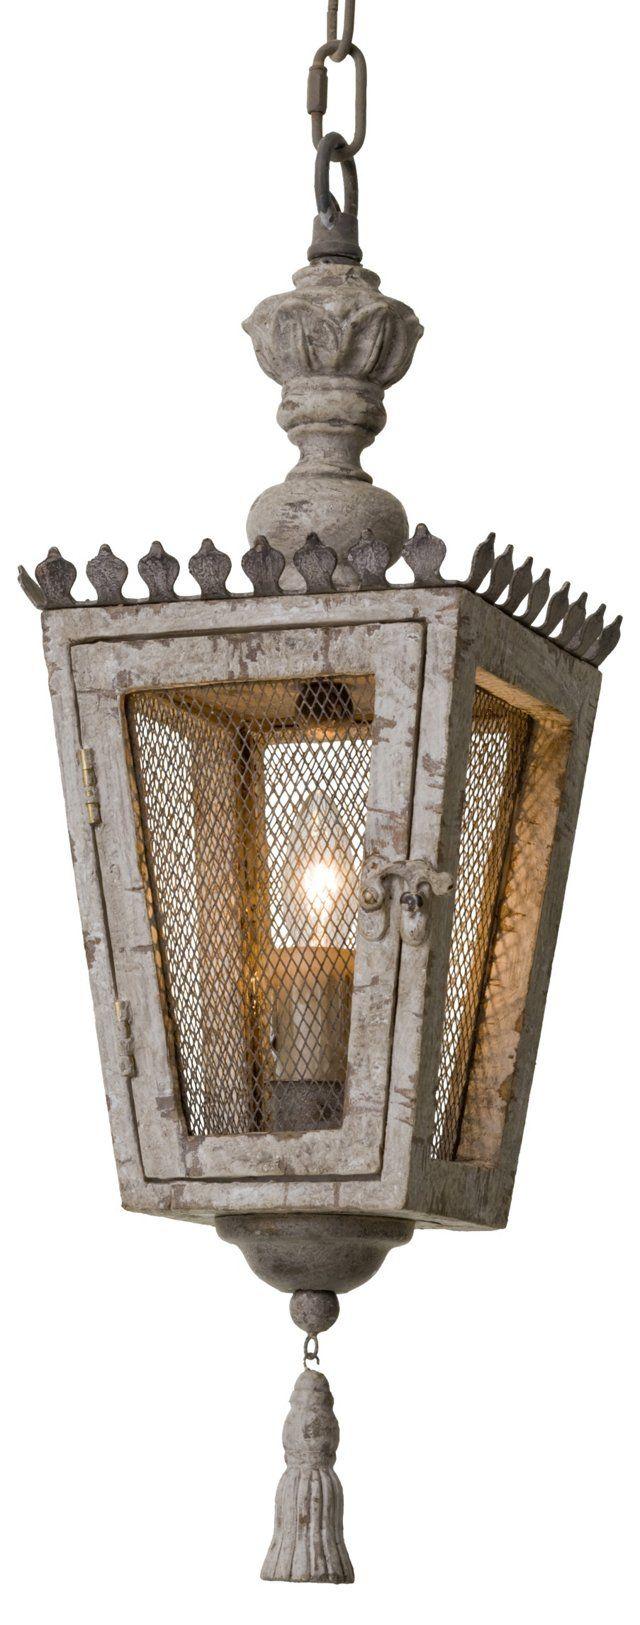 Chateau Lantern, Distressed Metal Metal lighting, French